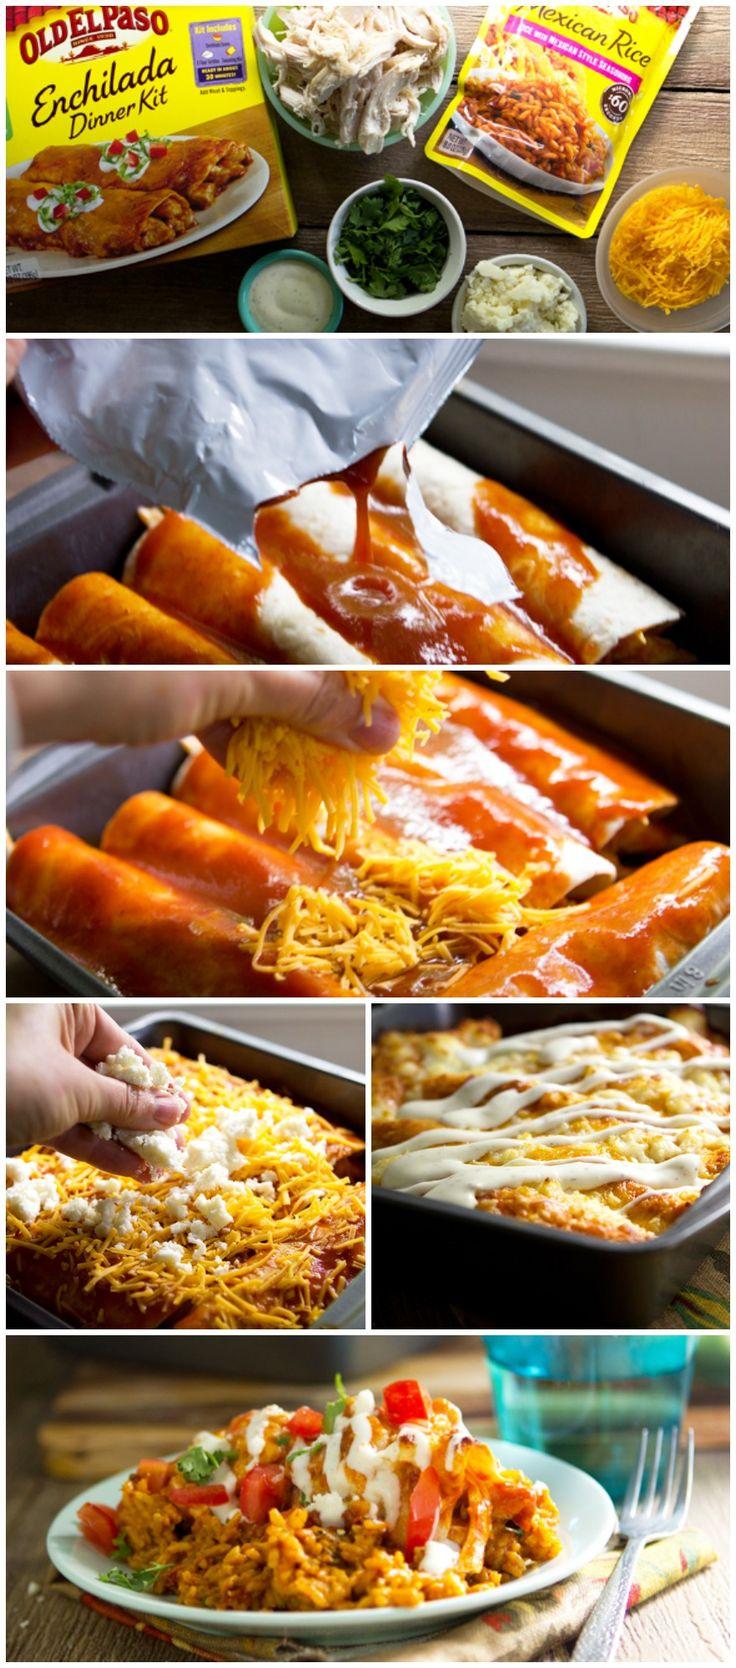 Ranch Chicken Enchiladas #oldelpaso